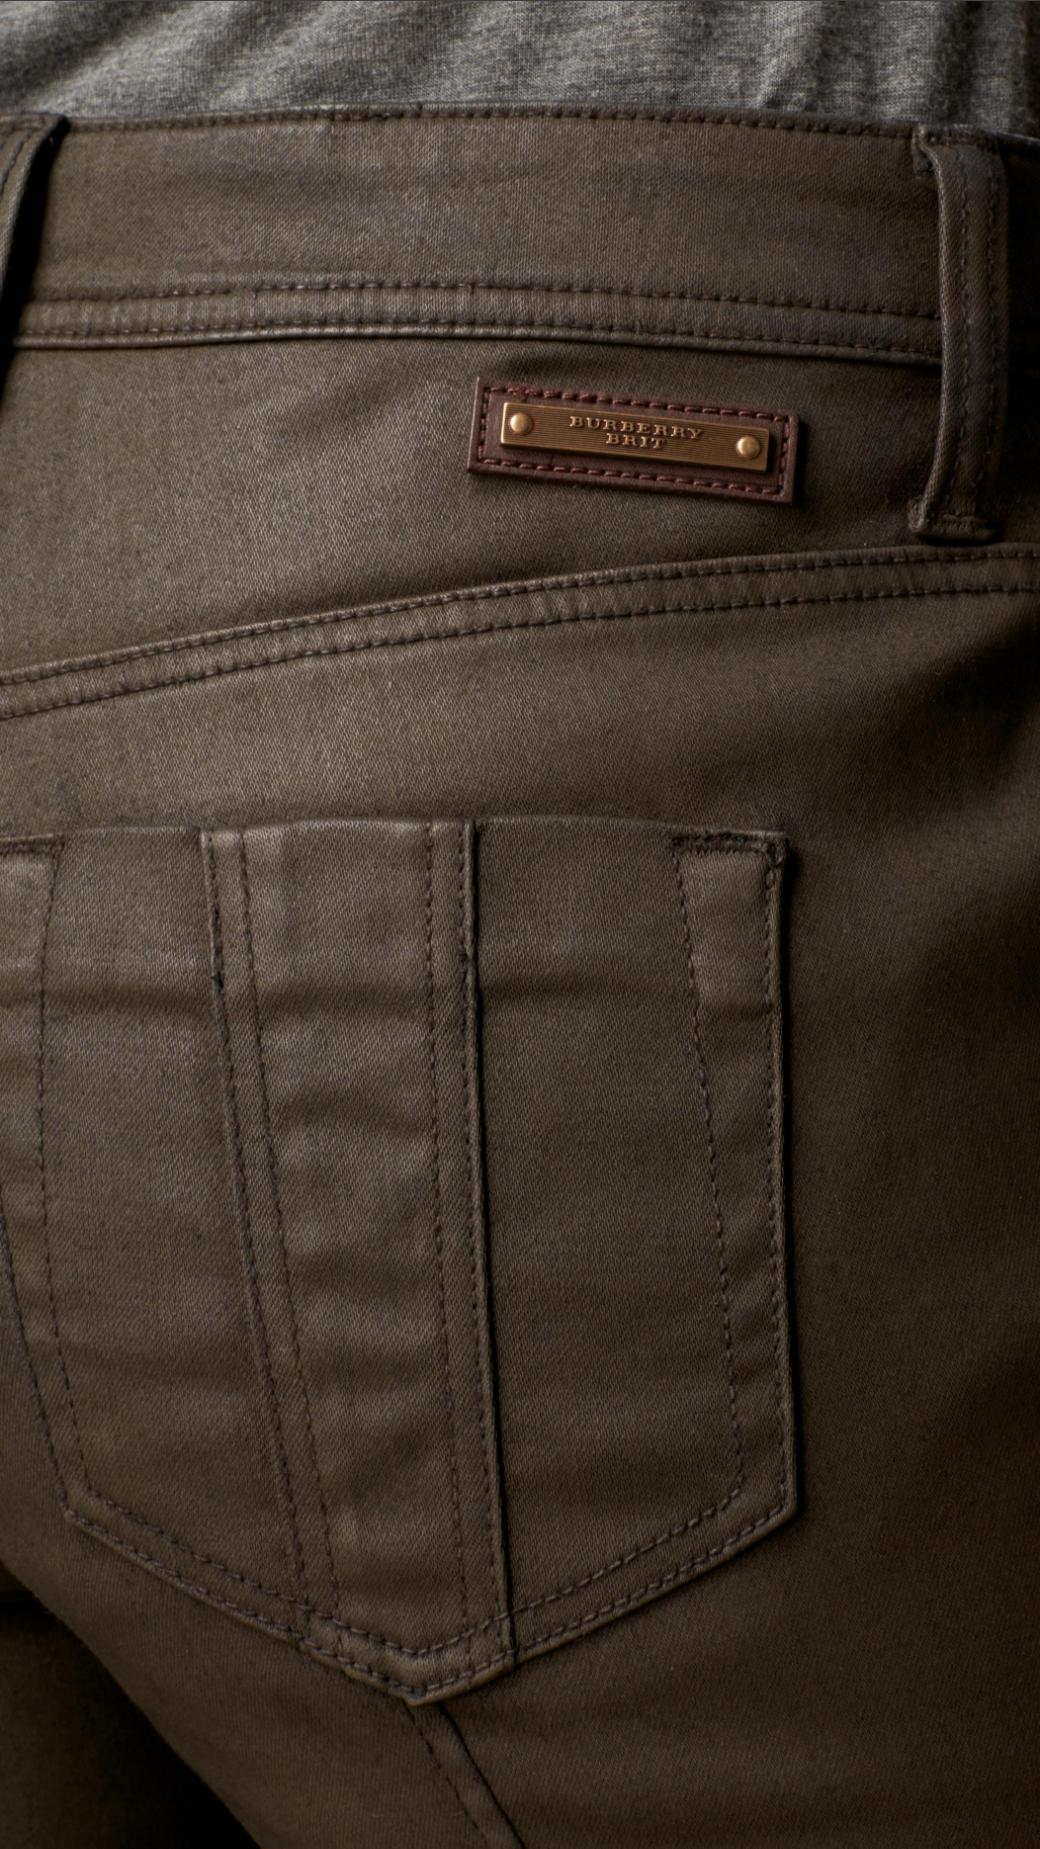 Khaki coated skinny jeans